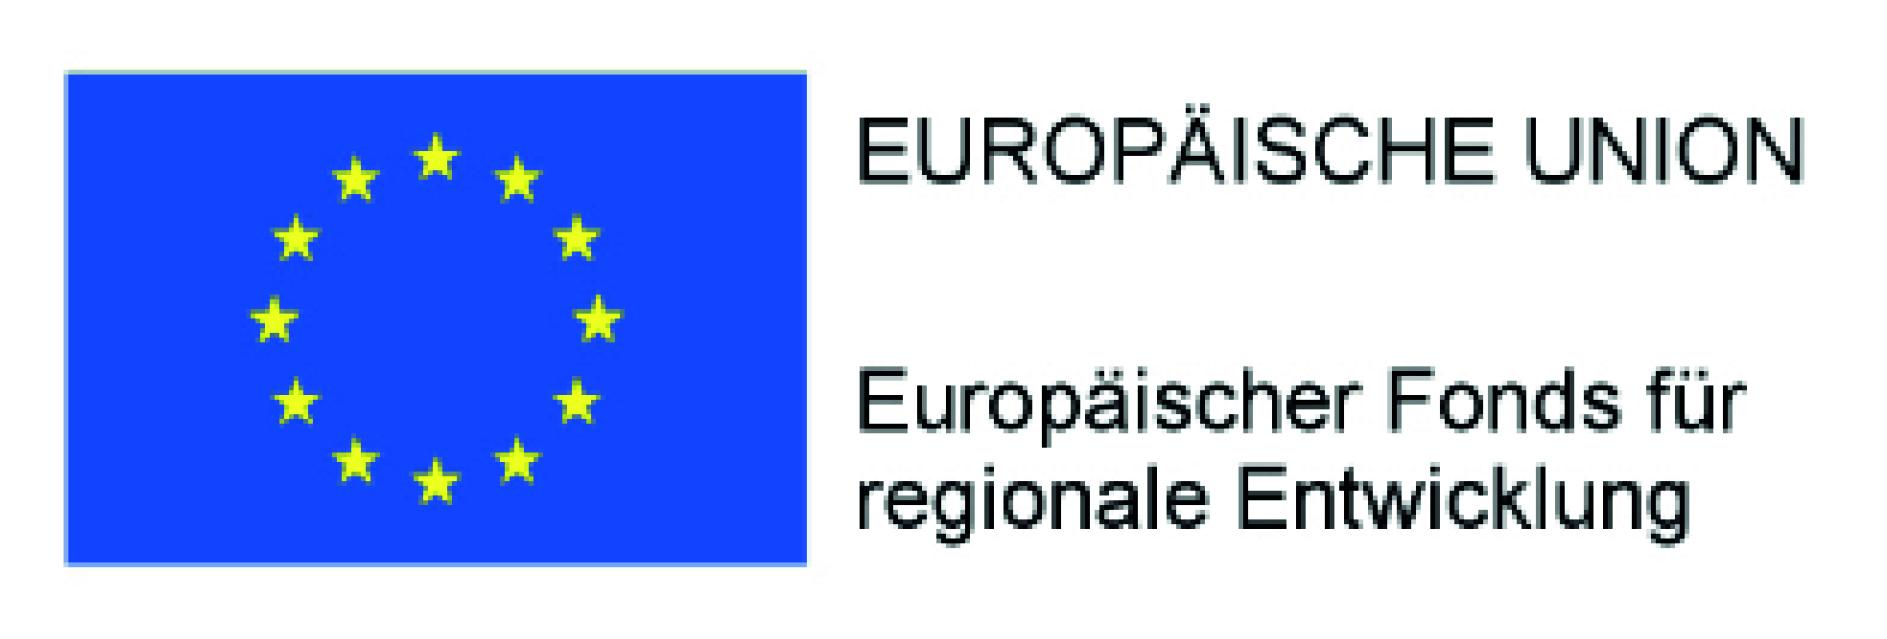 europ.Union